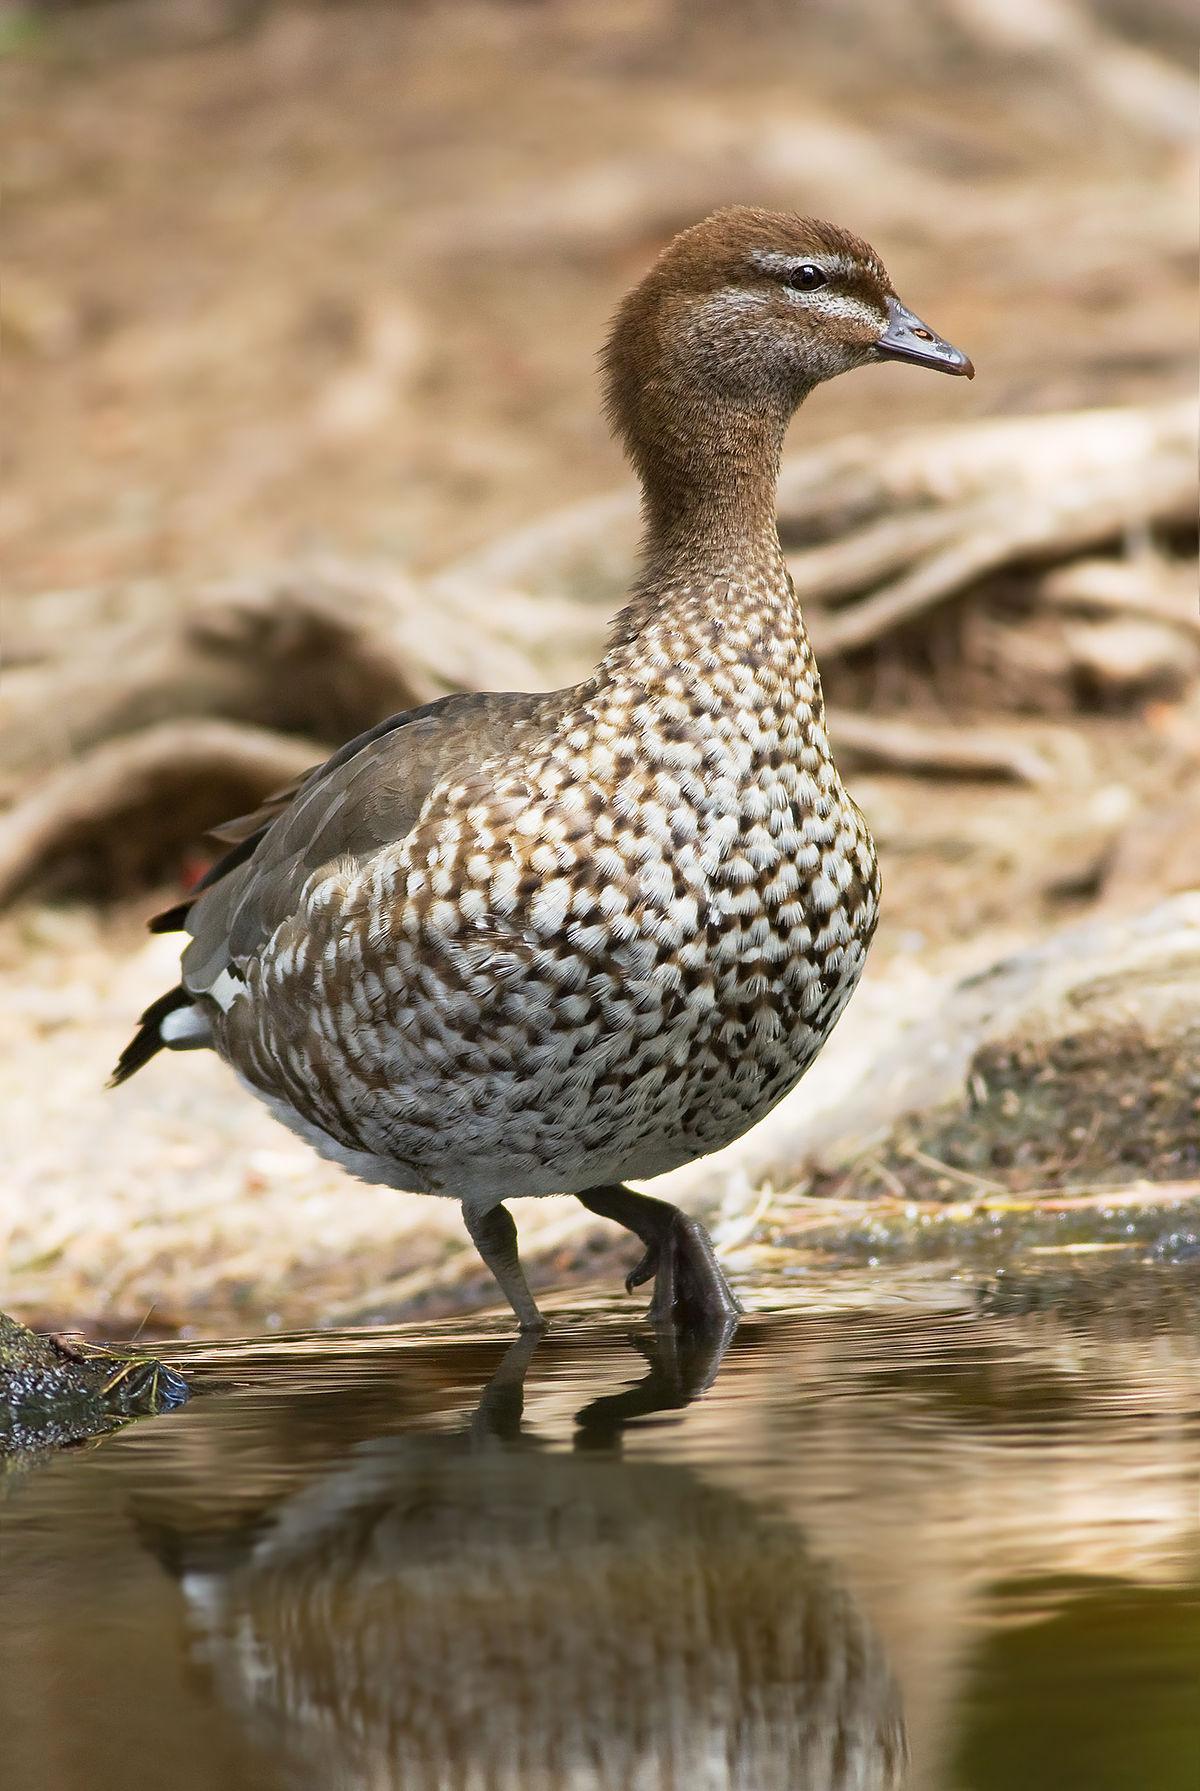 Australian wood duck - Wikipedia